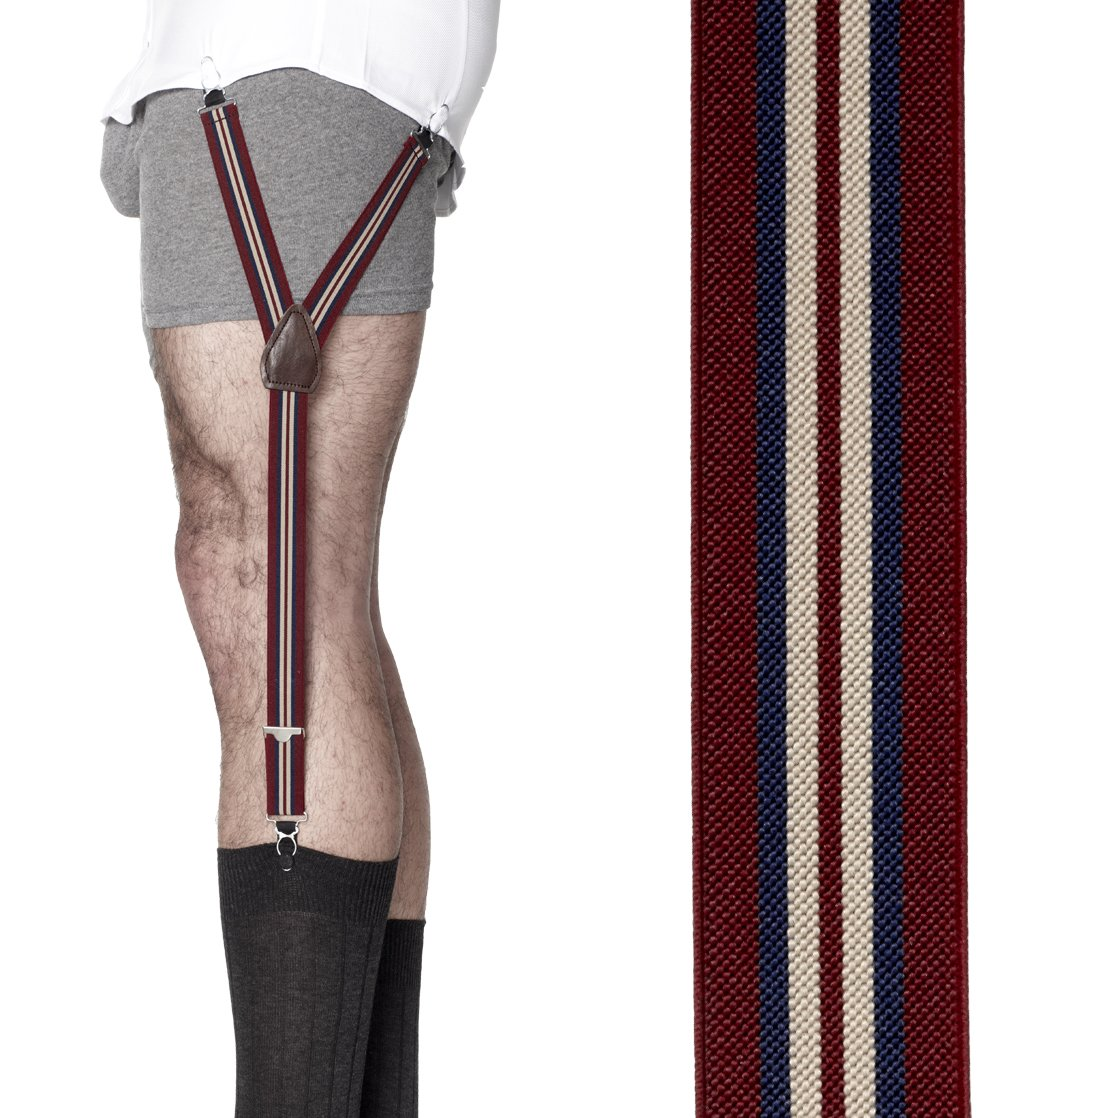 KK & Jay Supply Co. Shirttail Garters - Striped Shirt Stays (Crimson/Navy)